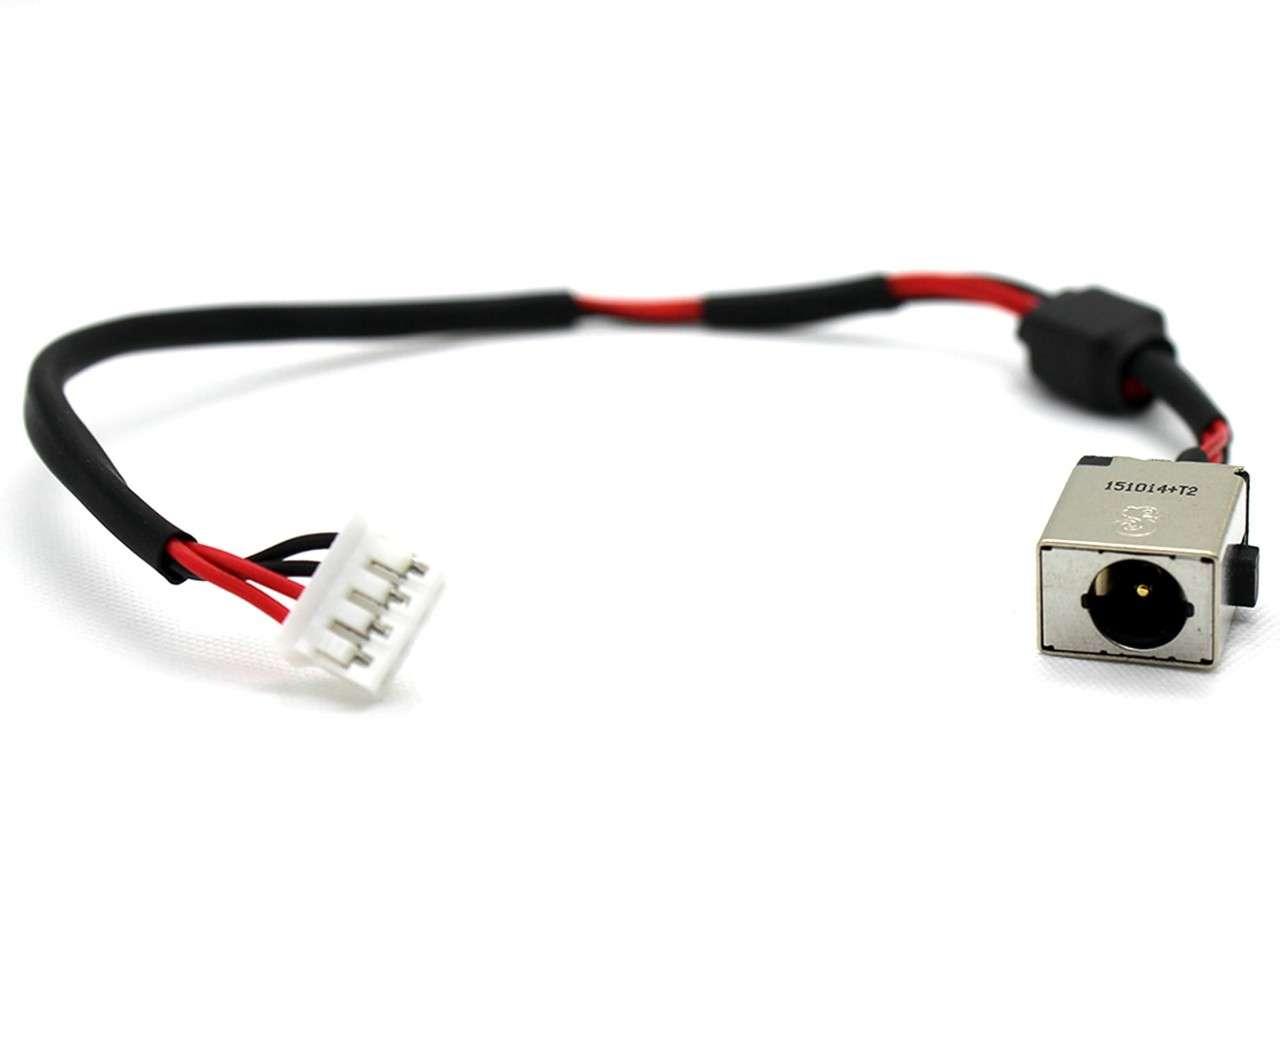 Mufa alimentare laptop Acer Aspire E5 511G cu fir imagine powerlaptop.ro 2021